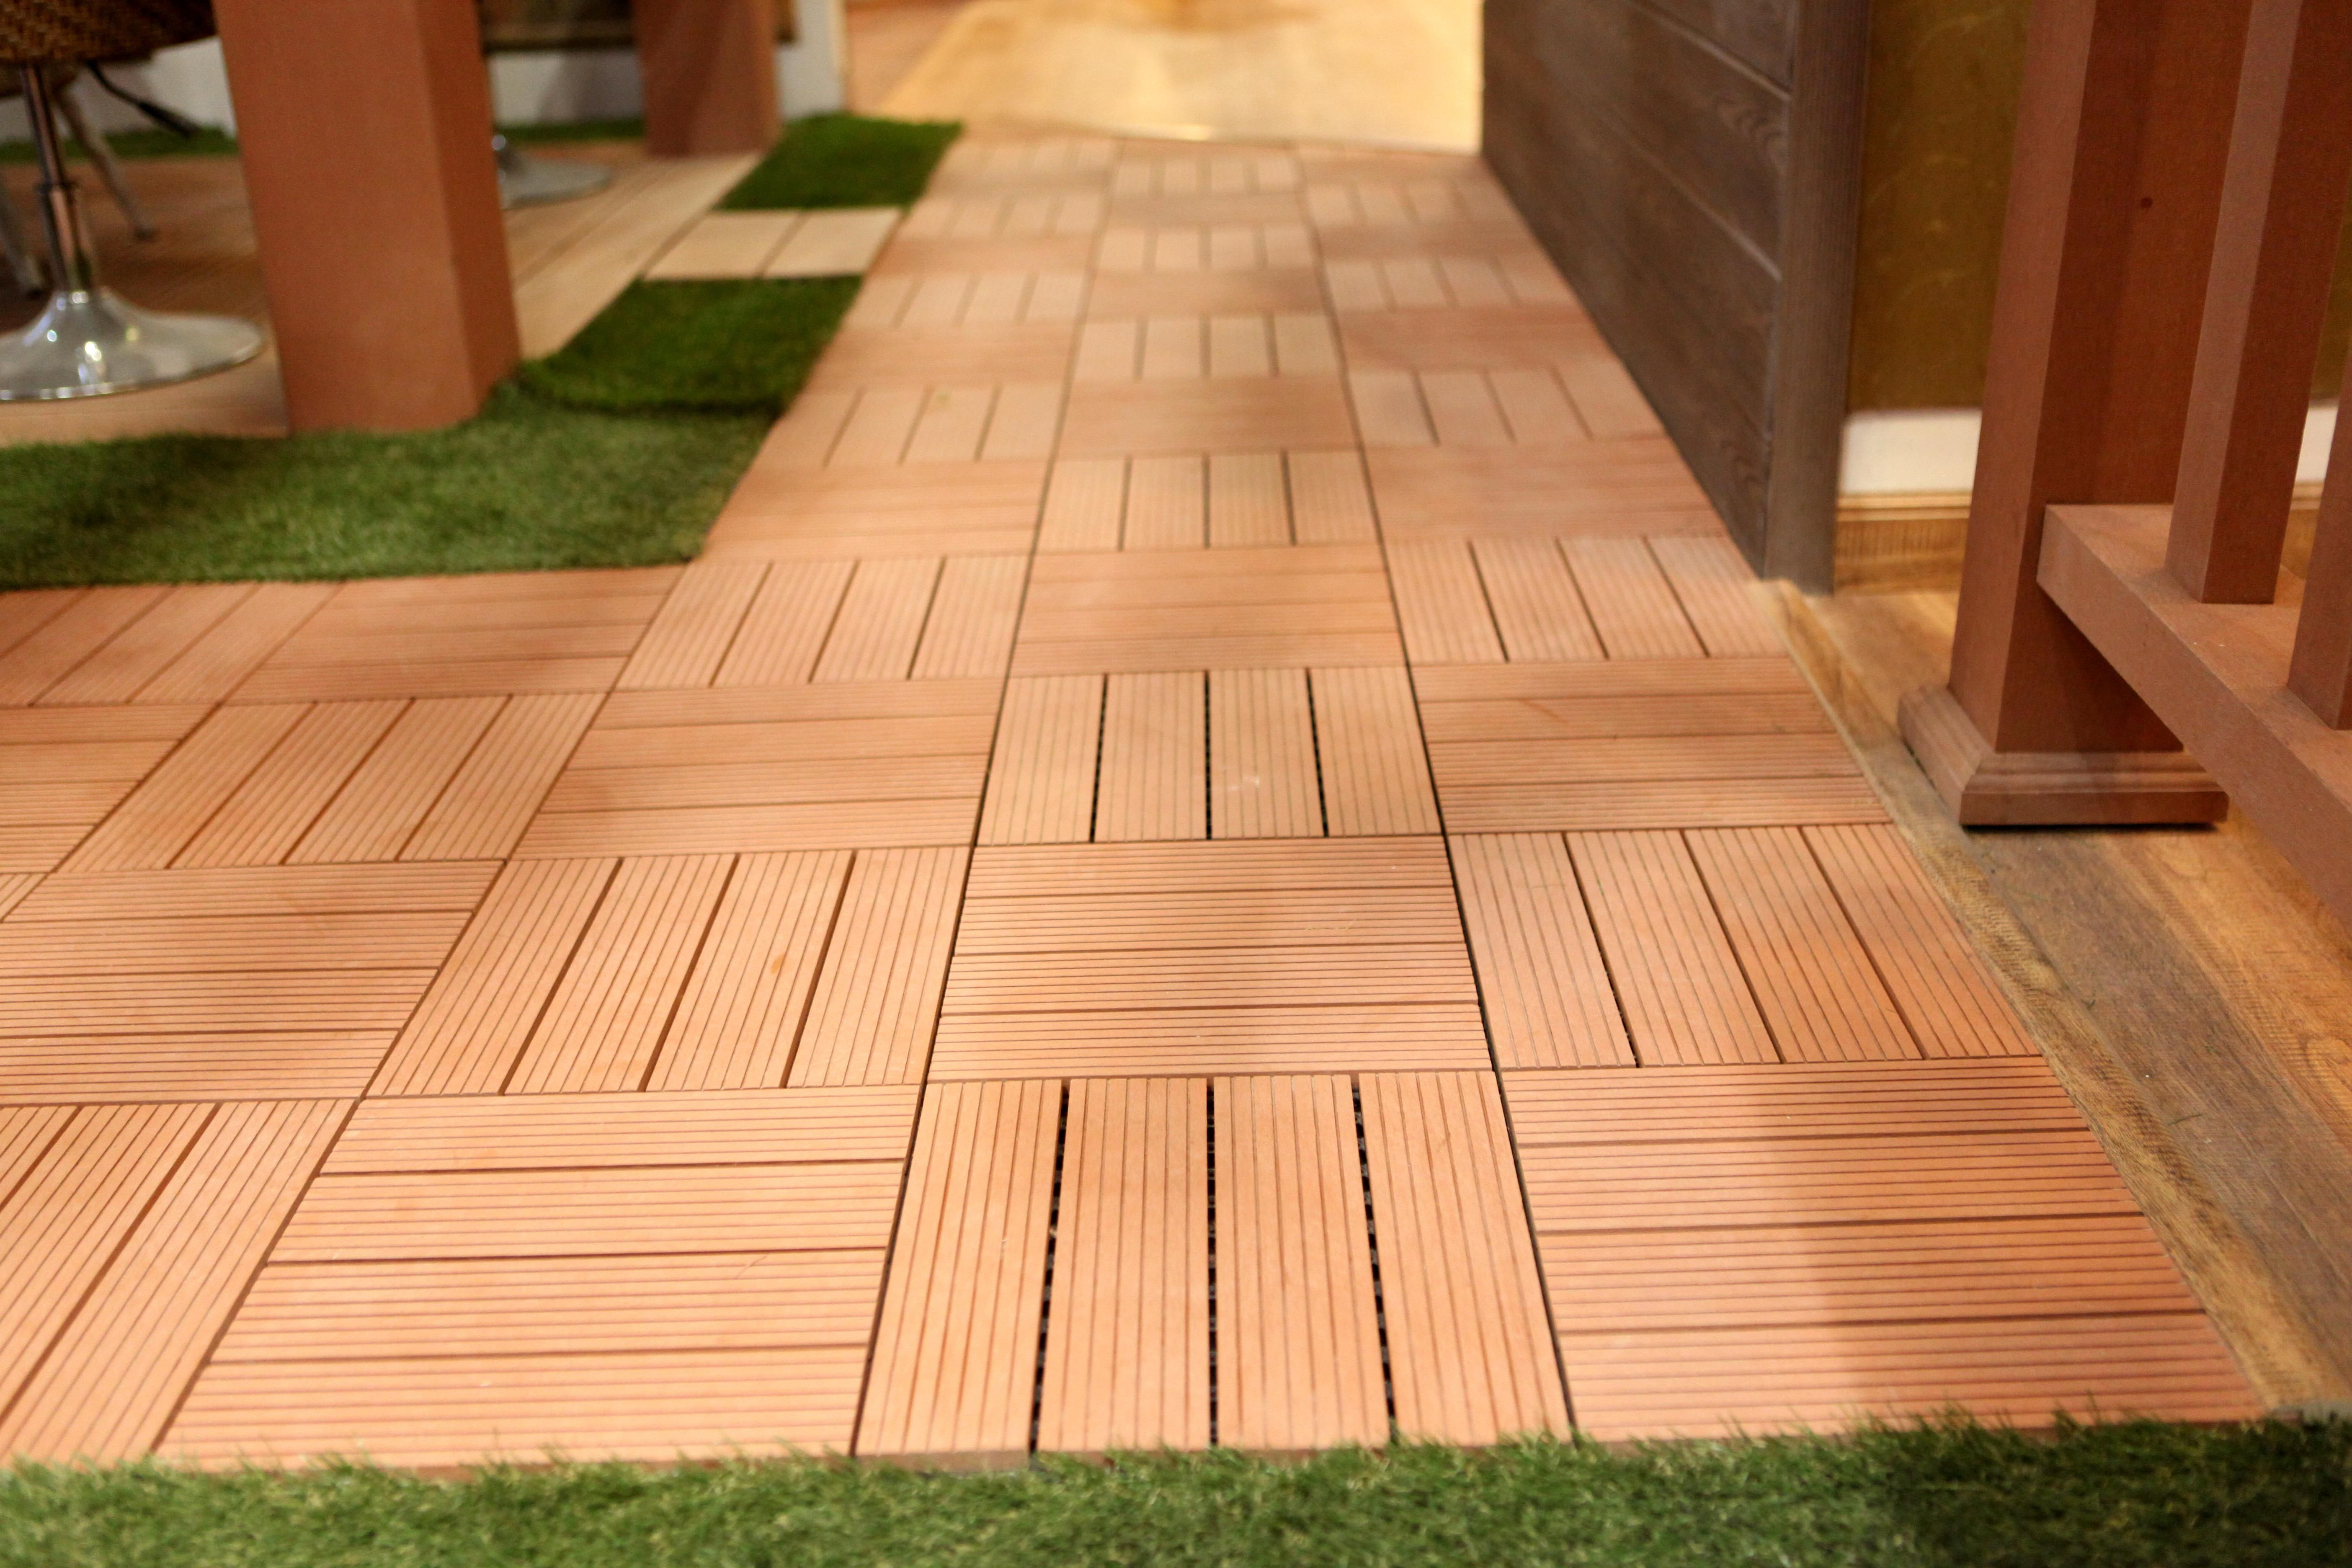 Wpc Outdoor Diy Deck Shanghai Seven Trust Company With Images Outdoor Deck Decorating Wood Deck Designs Diy Deck